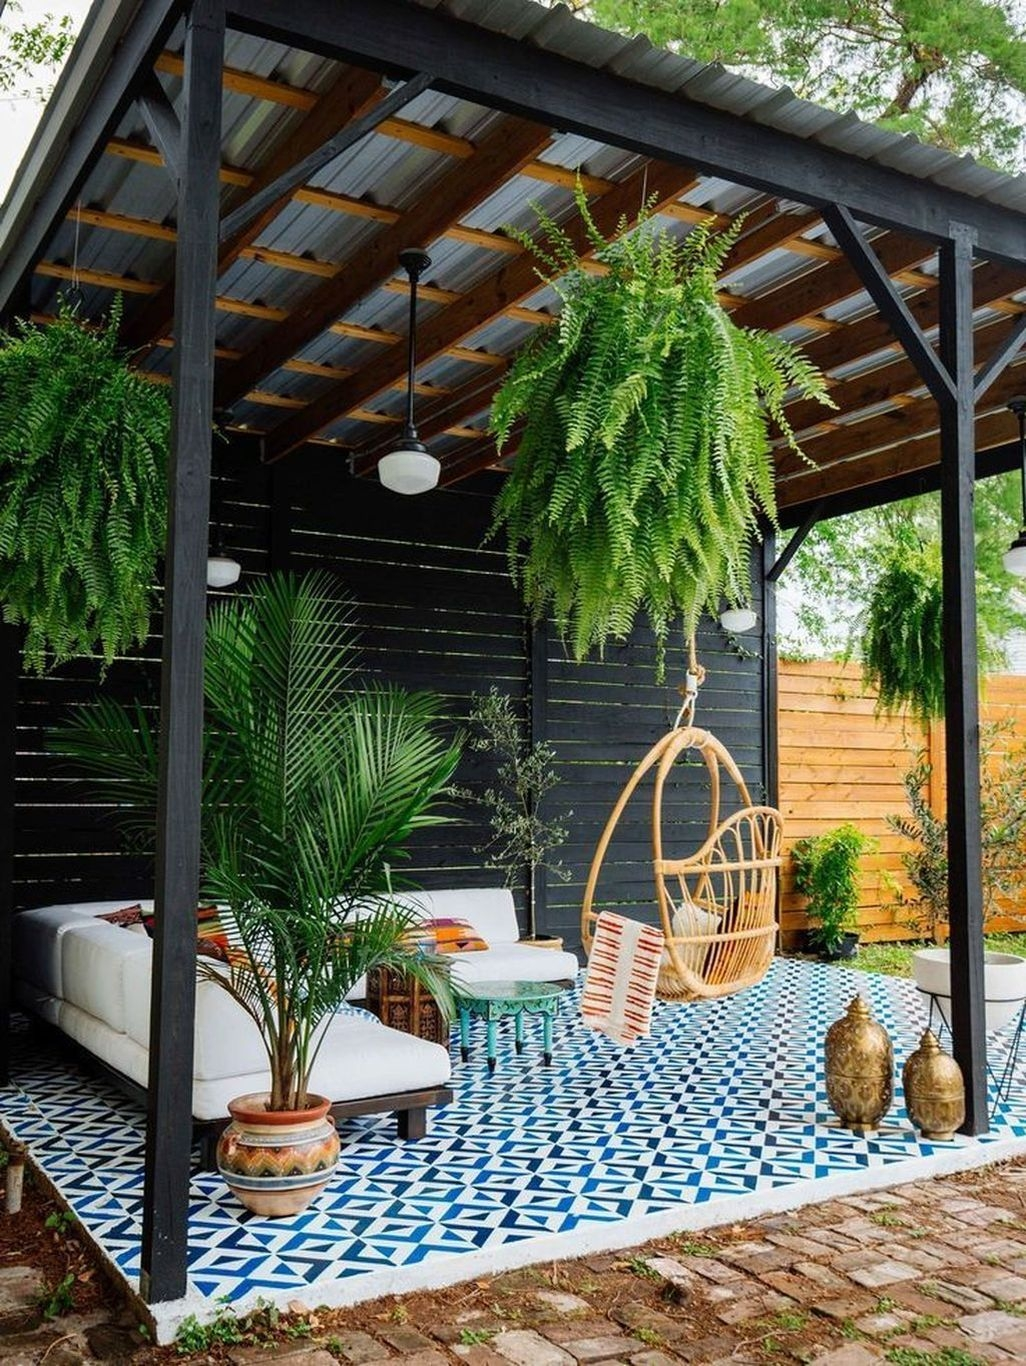 Creative DIY Patio Gardens Ideas On A Budget 23